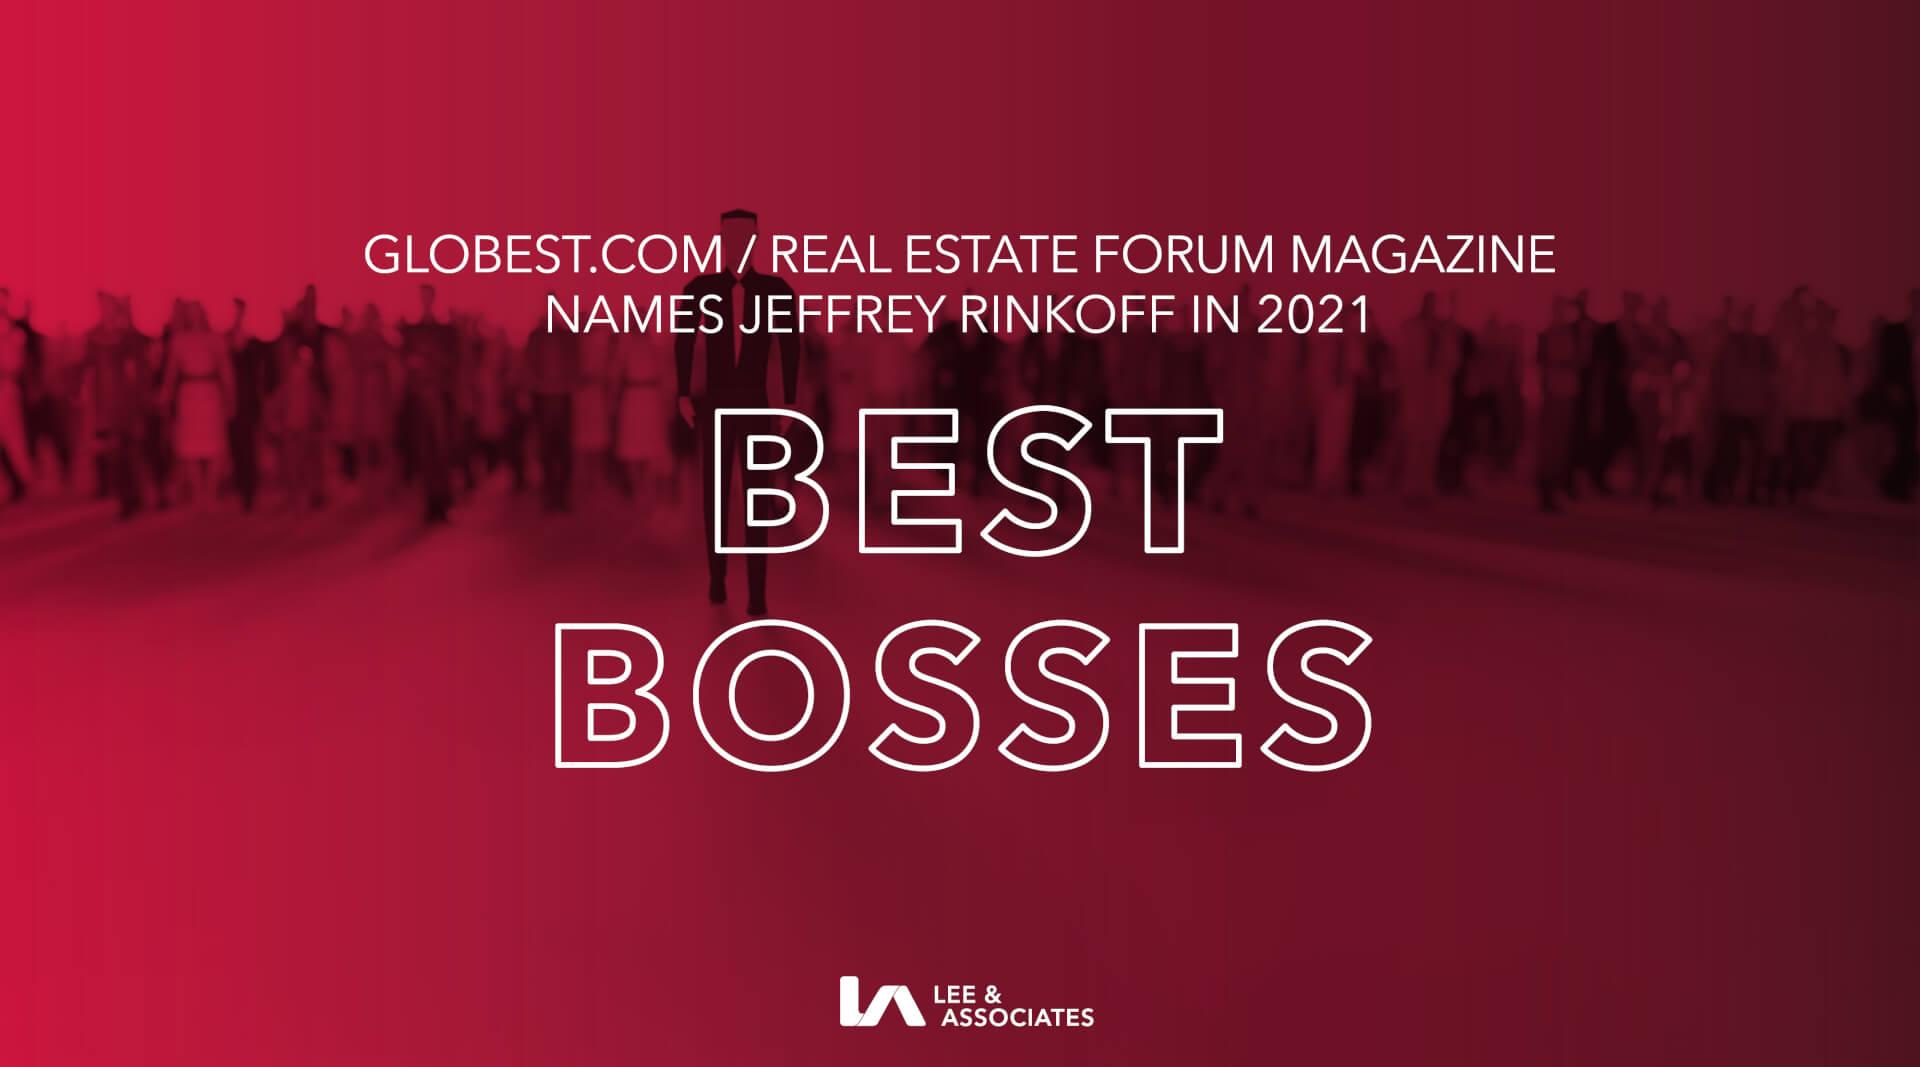 Lee & Associates CEO, Jeffrey Rinkov, Named in GlobeSt. 2021 Best Bosses